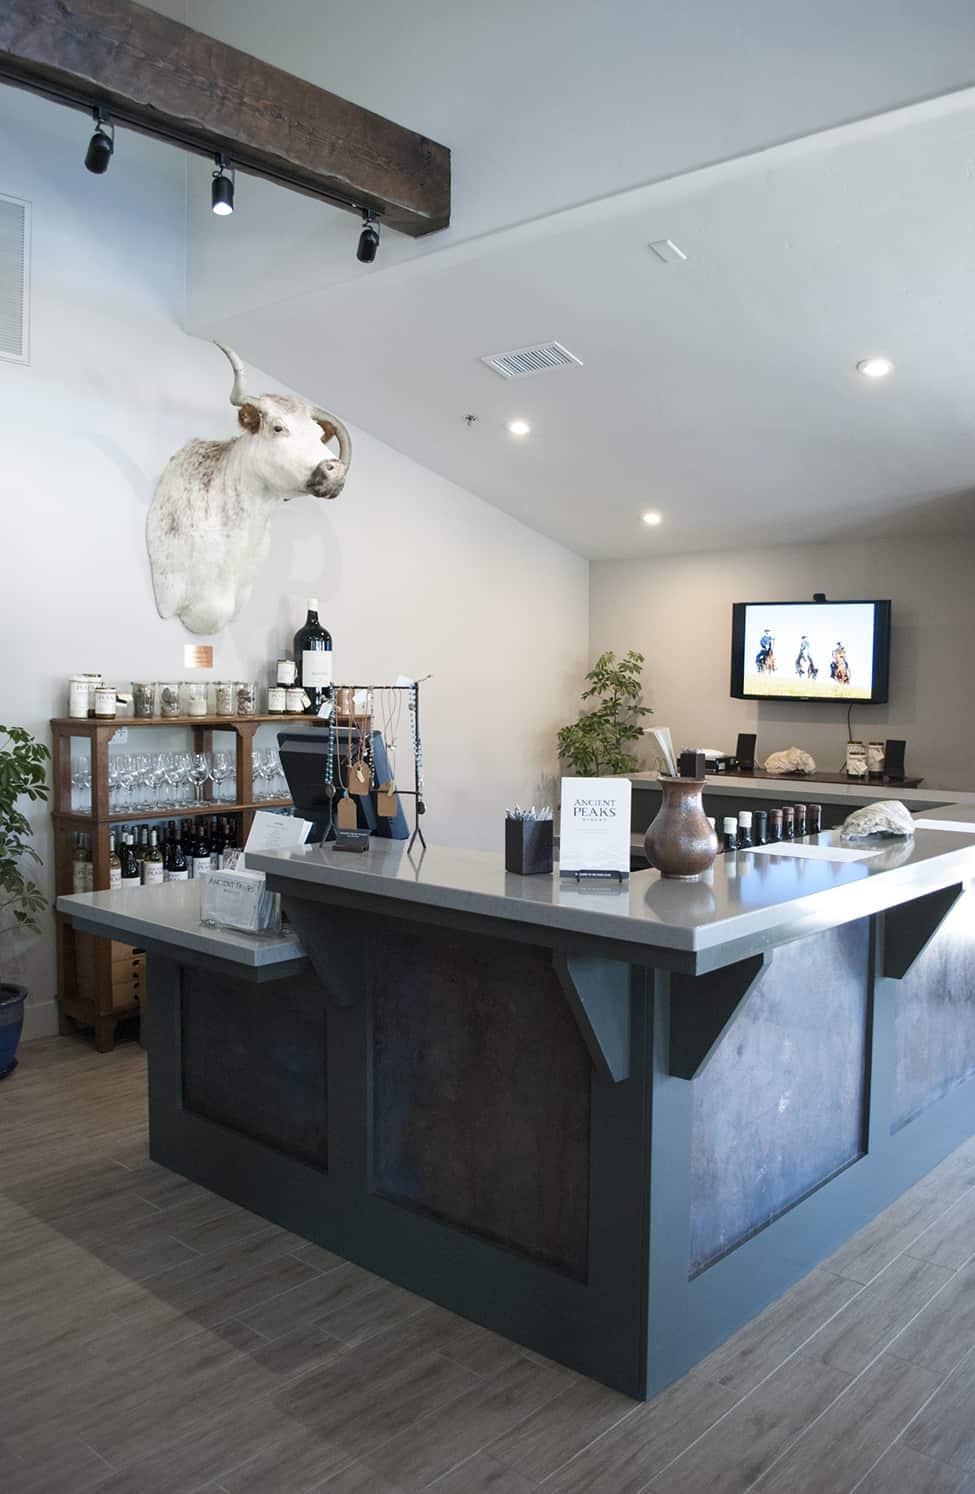 Ancient Peaks Winery in Santa Margarita - San Luis Obispo